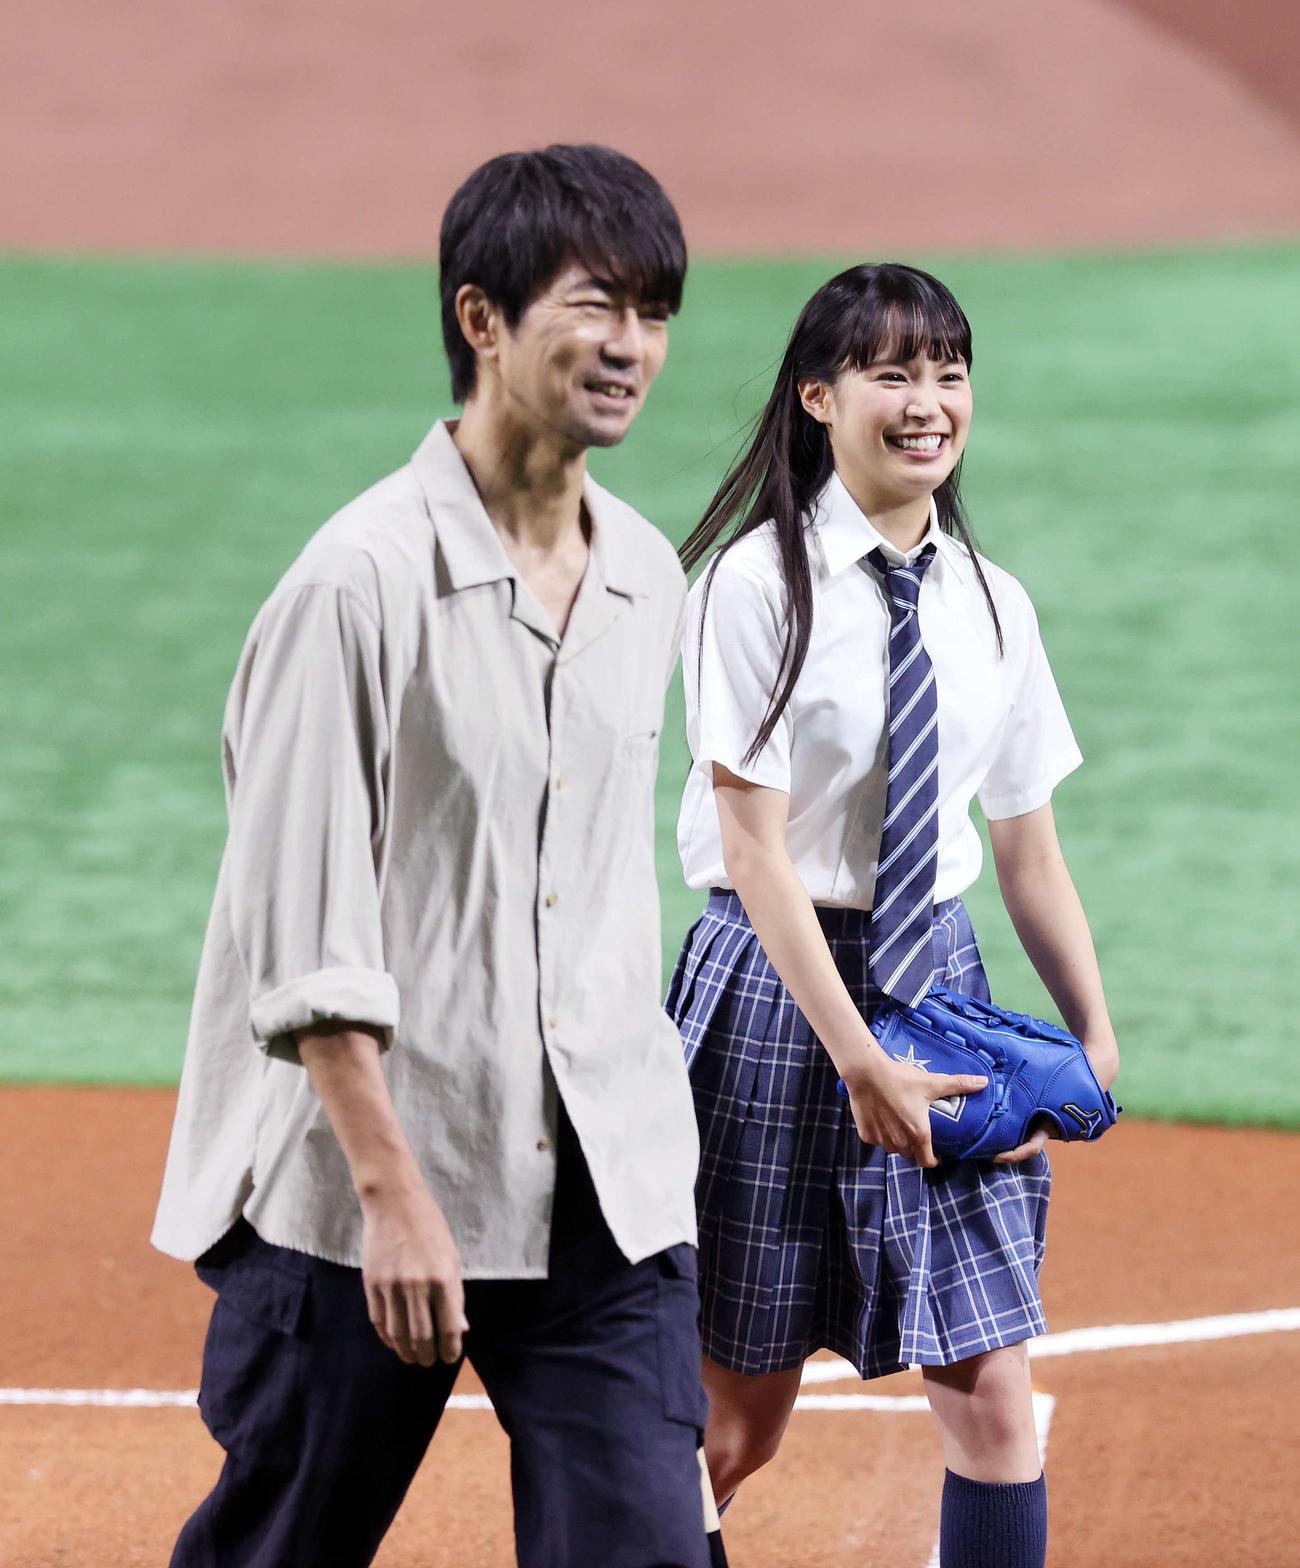 DeNA対広島 始球式を終え笑顔を見せる仲村トオル(左)と関水渚(撮影・鈴木正人)